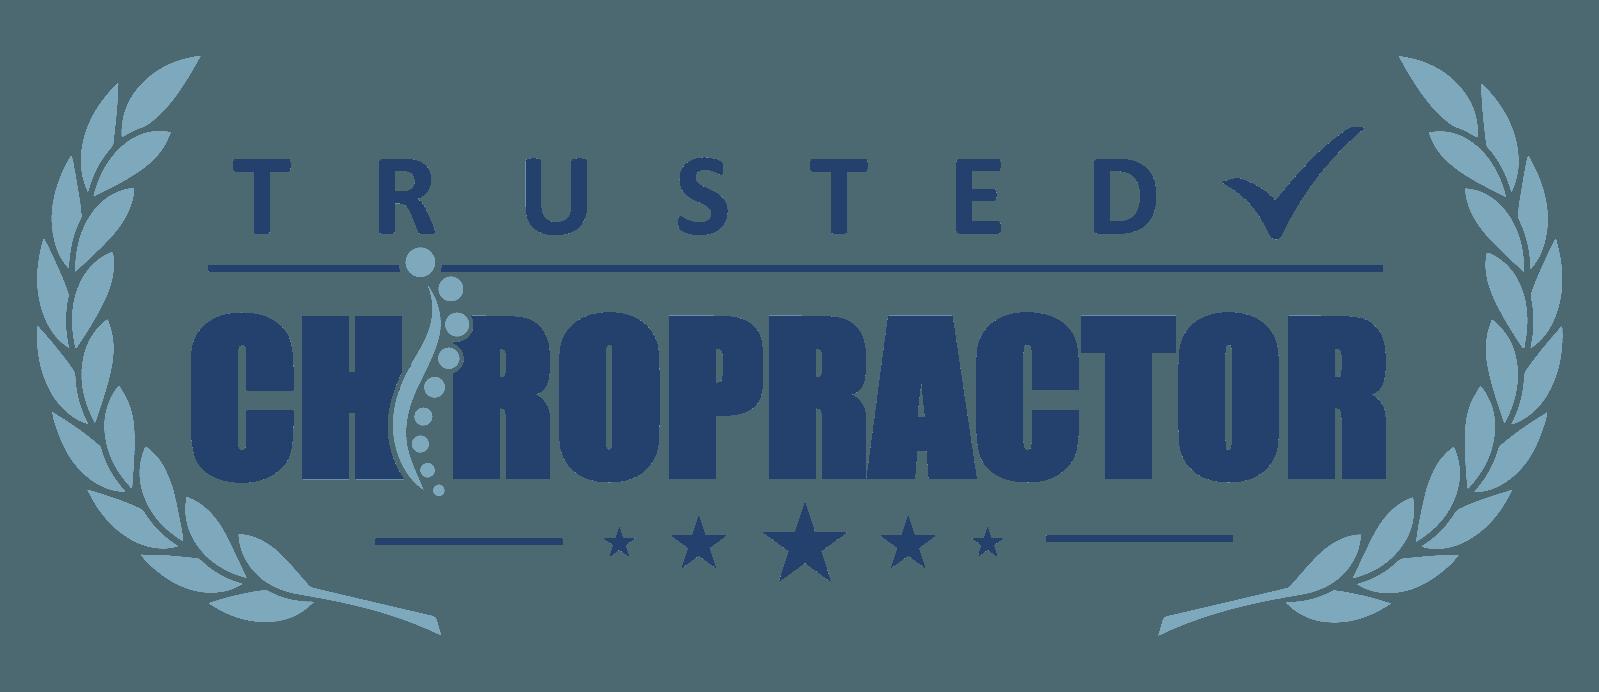 Chiropractic Oak Creek WI Trusted Chiropractor